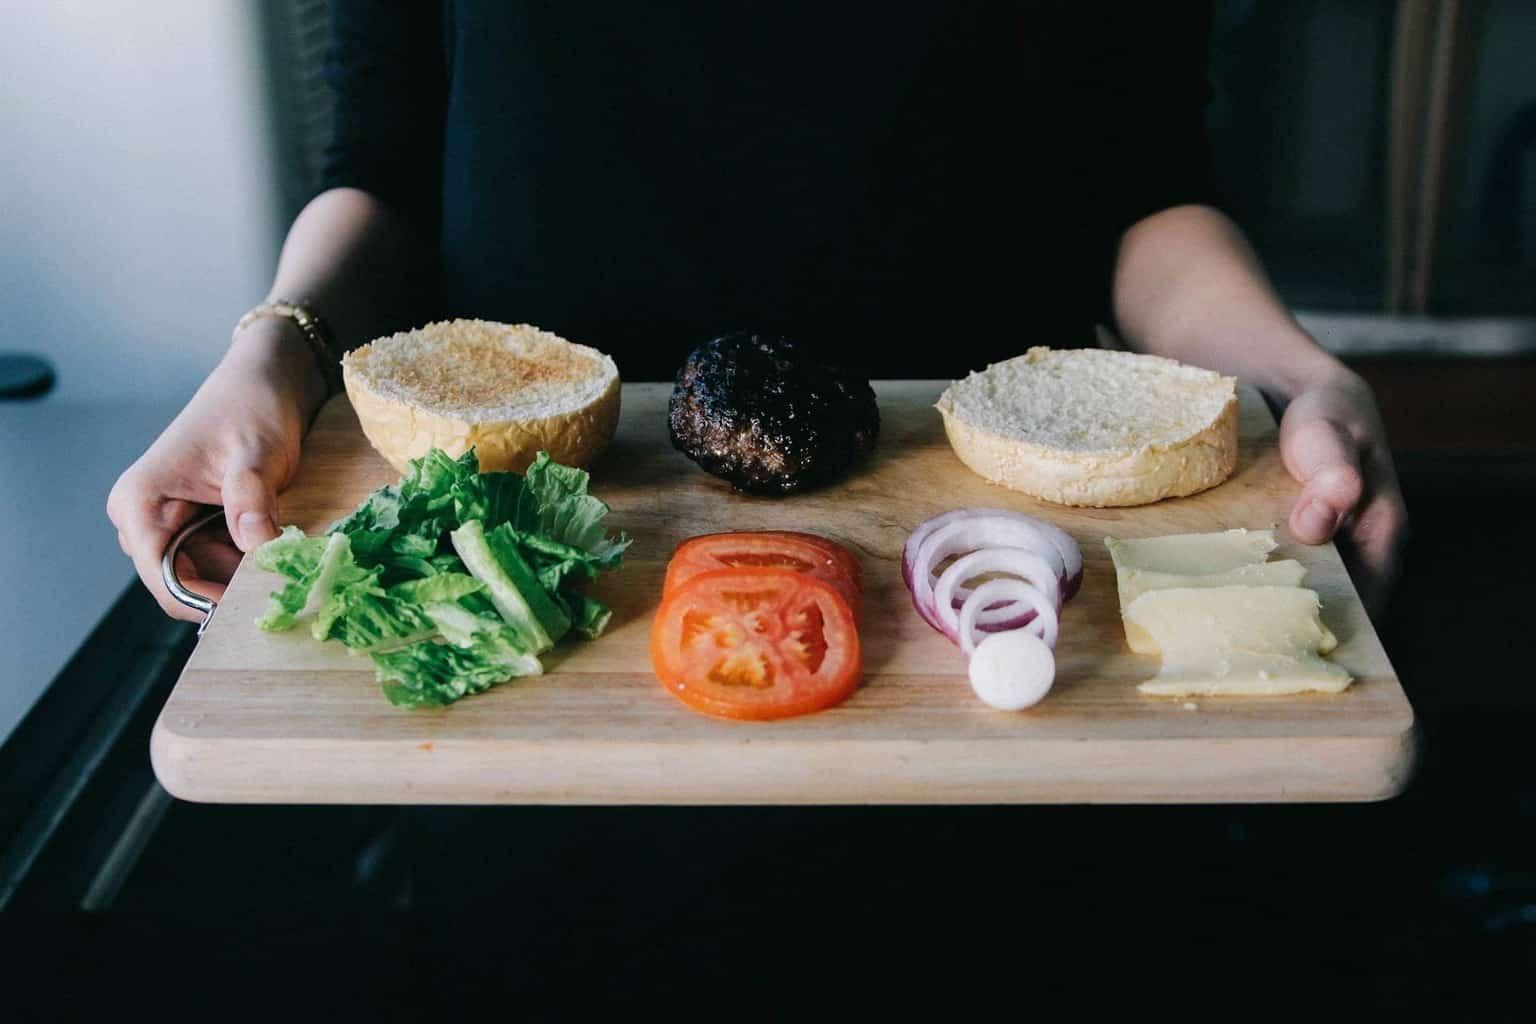 hamburger e carne falsa